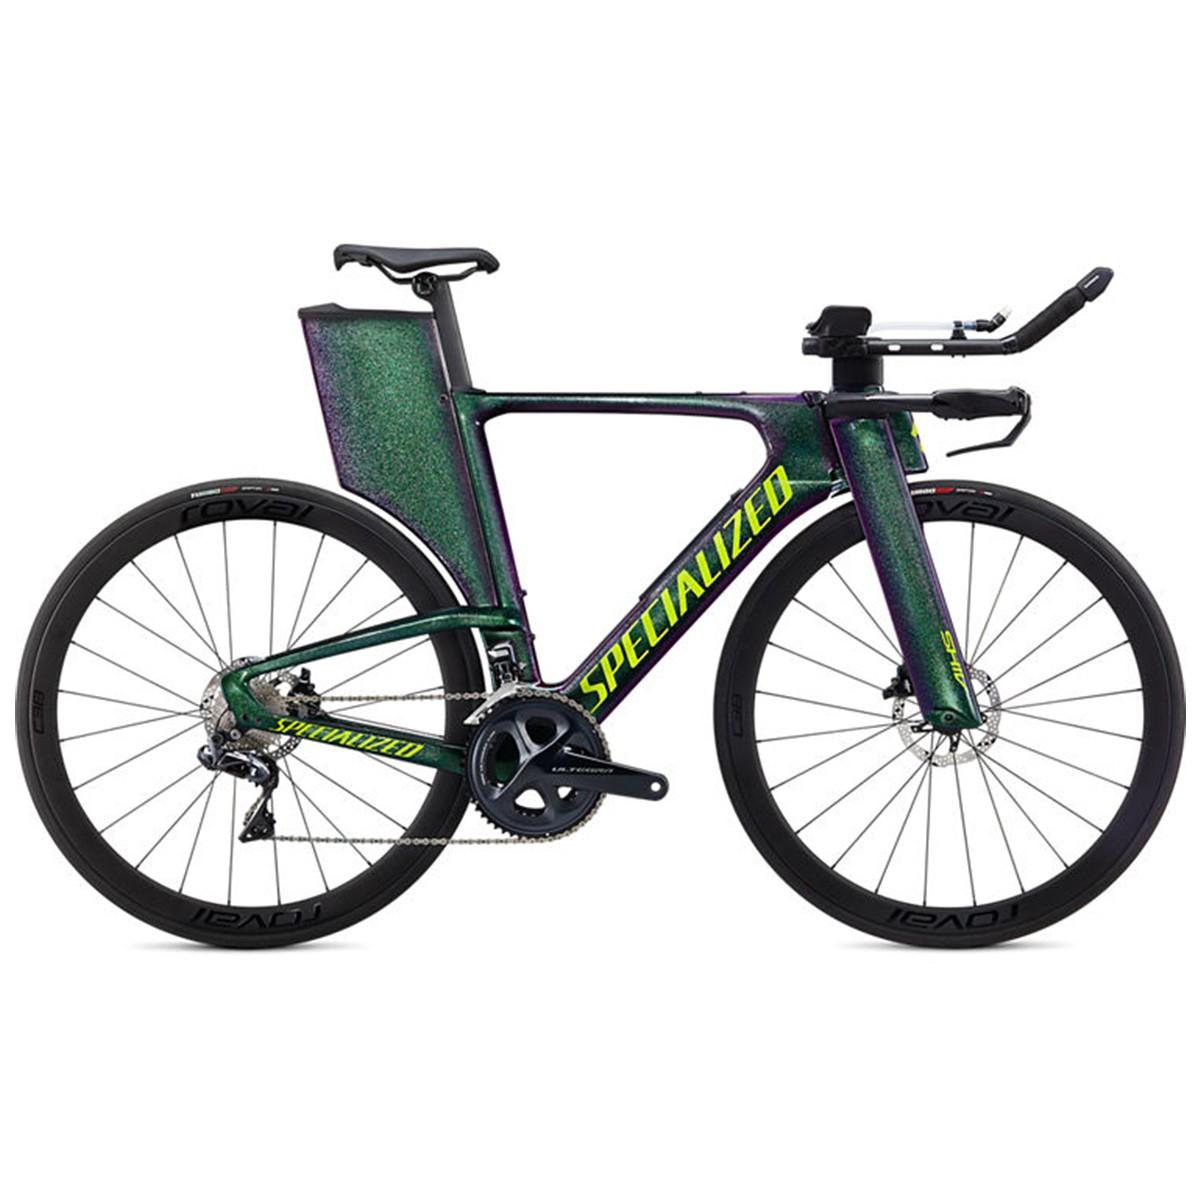 Bicicleta Specialized Shiv Expert Disc Udi2 2020